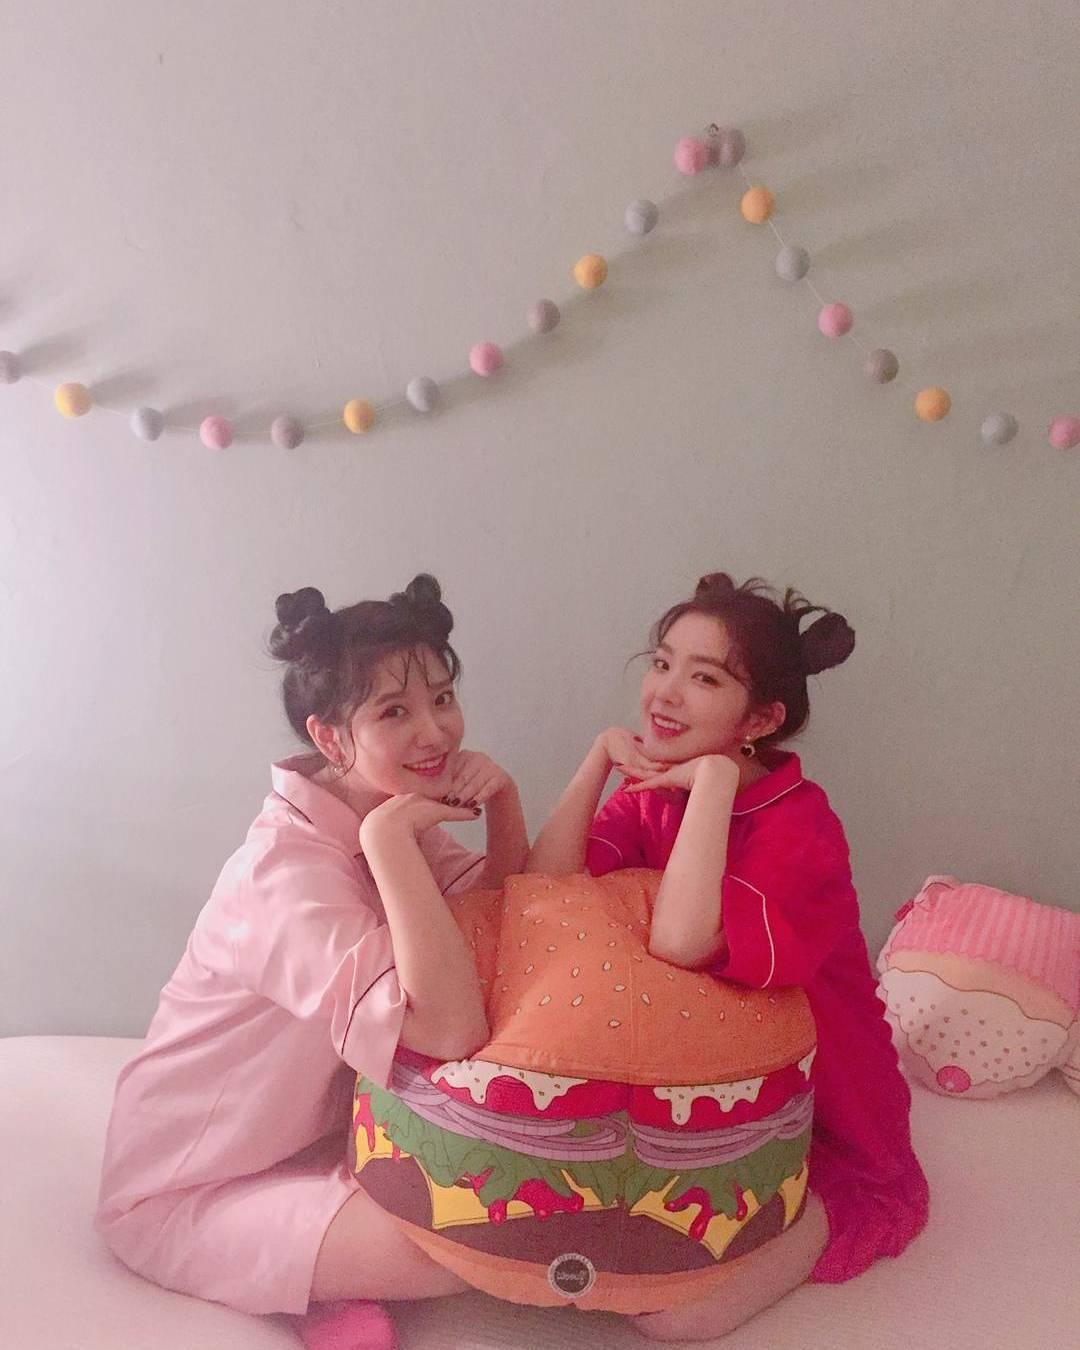 Red Velvet Yeri Yeri真的超級適合羊角頭!超級可愛的!! 不過 Irene完全看不出來跟Yeri差8歲呢~ 畫面真是太美好了~